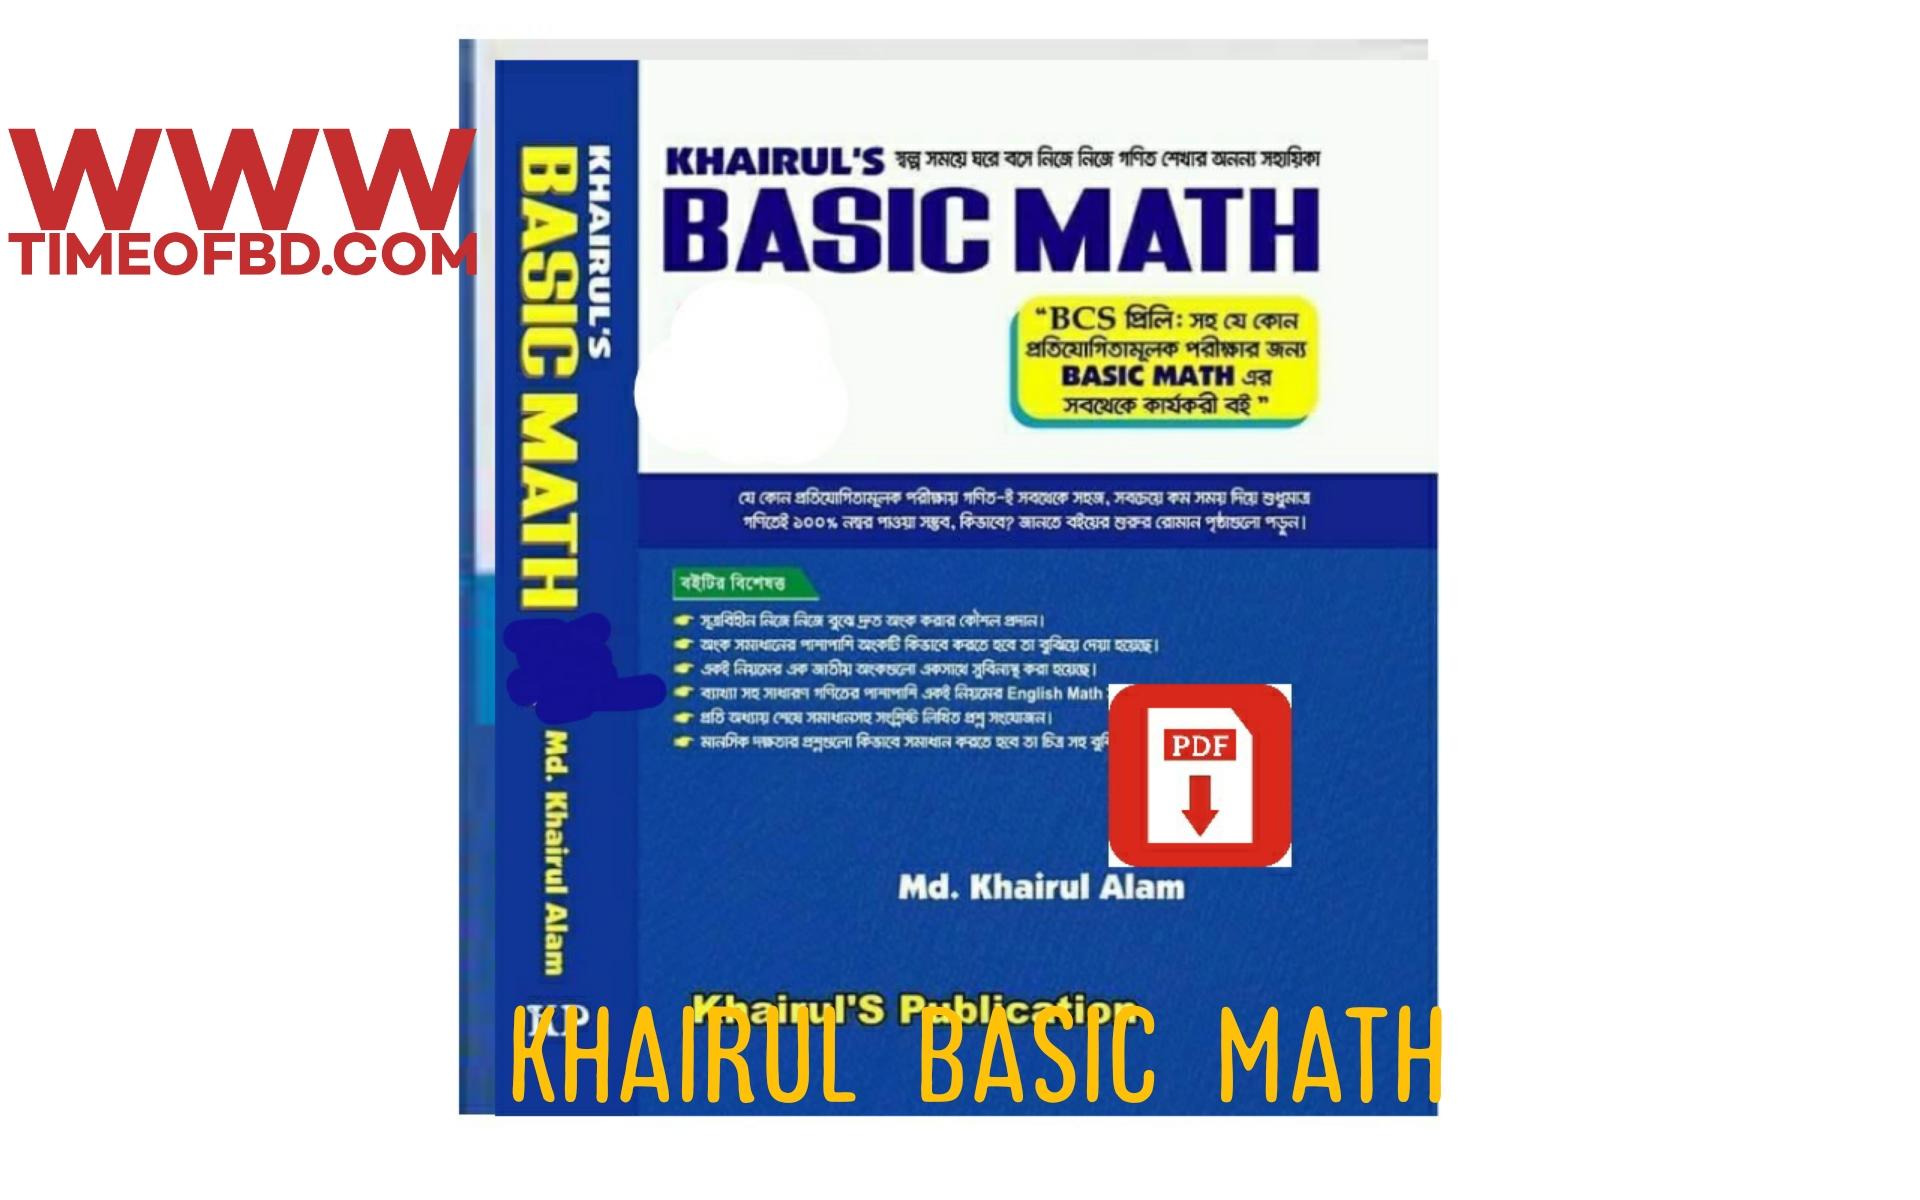 Khairul basic math। খাইরুল বেসিক ম্যাথ